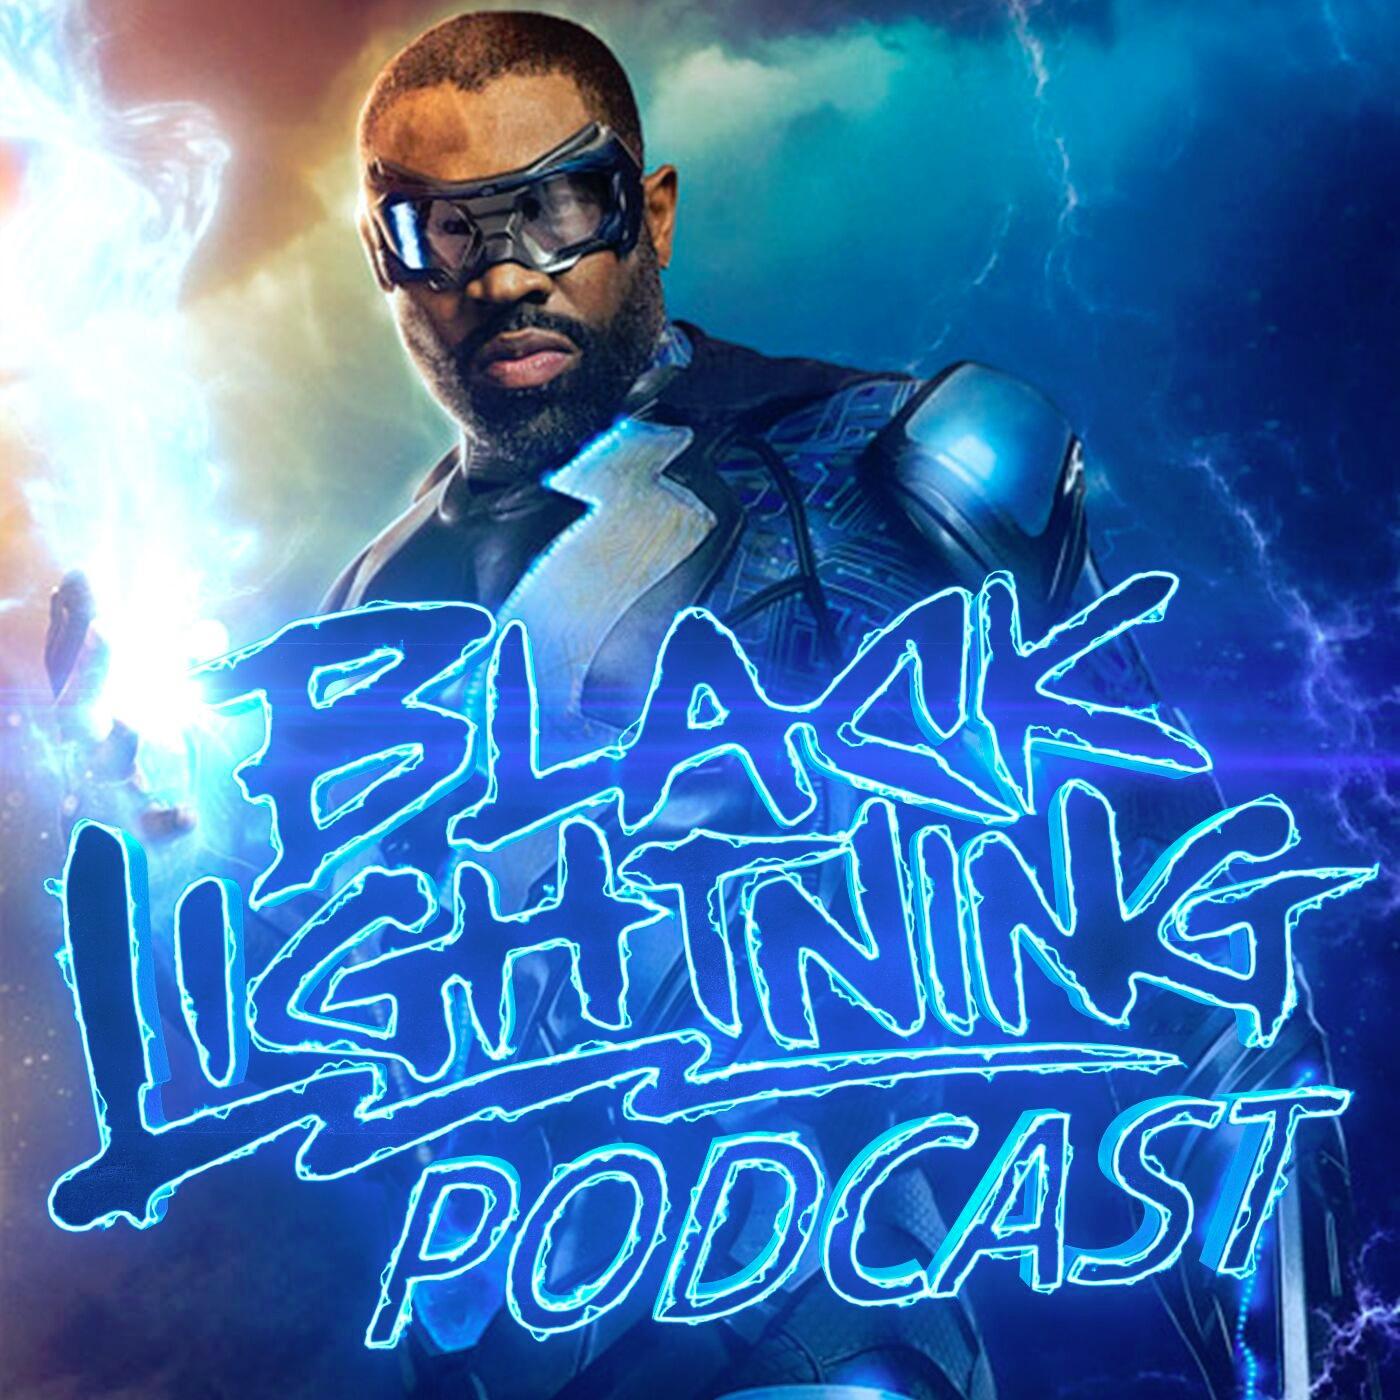 Black Lightning Podcast on TalkingTimelords.com